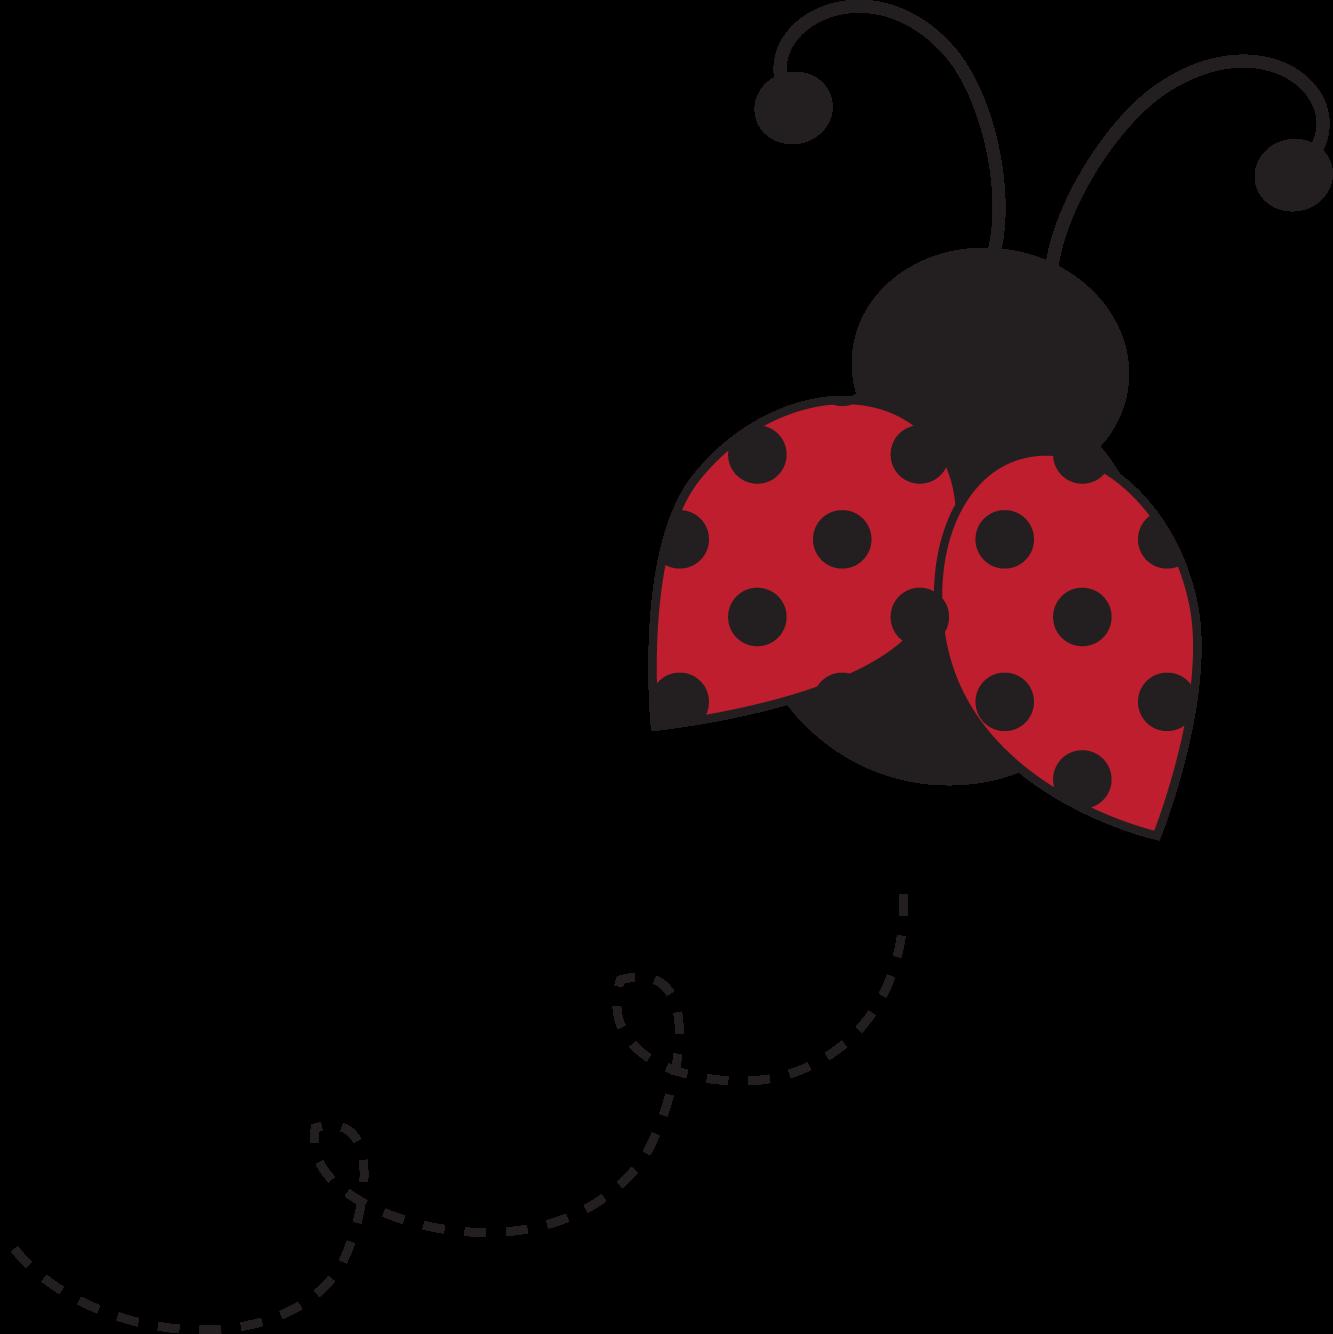 1333x1334 Baby Ladybug Clip Art. Oh My Baby!